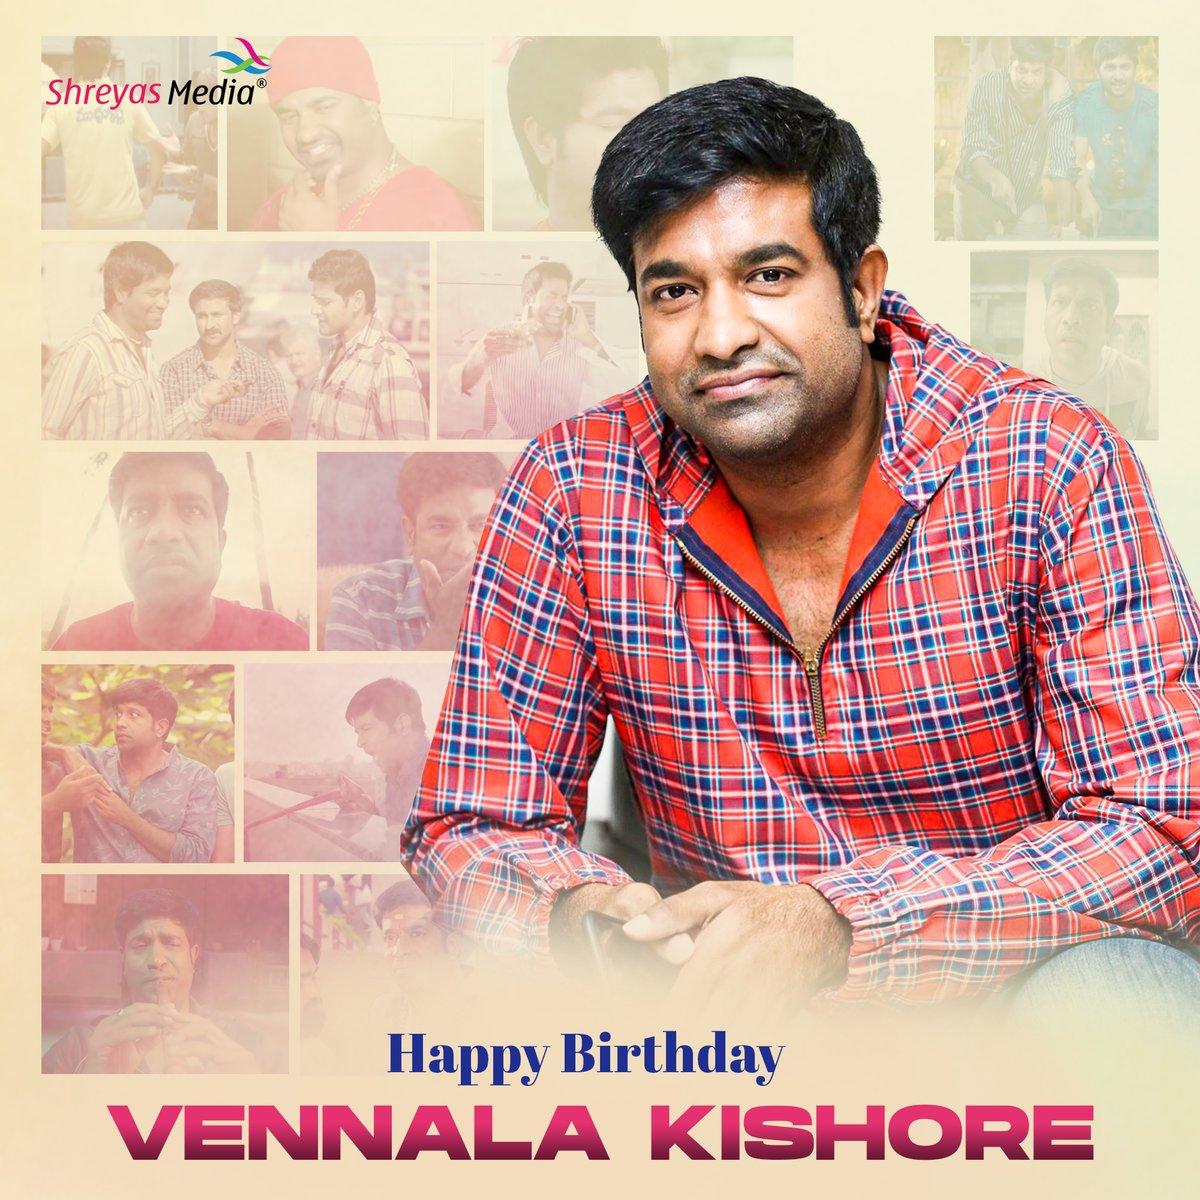 Happy Birthday Vennela Kishore Gaaru🎉🎉 #ShreyasMedia #Shreyasgroup https://t.co/4FSNKx0b0F